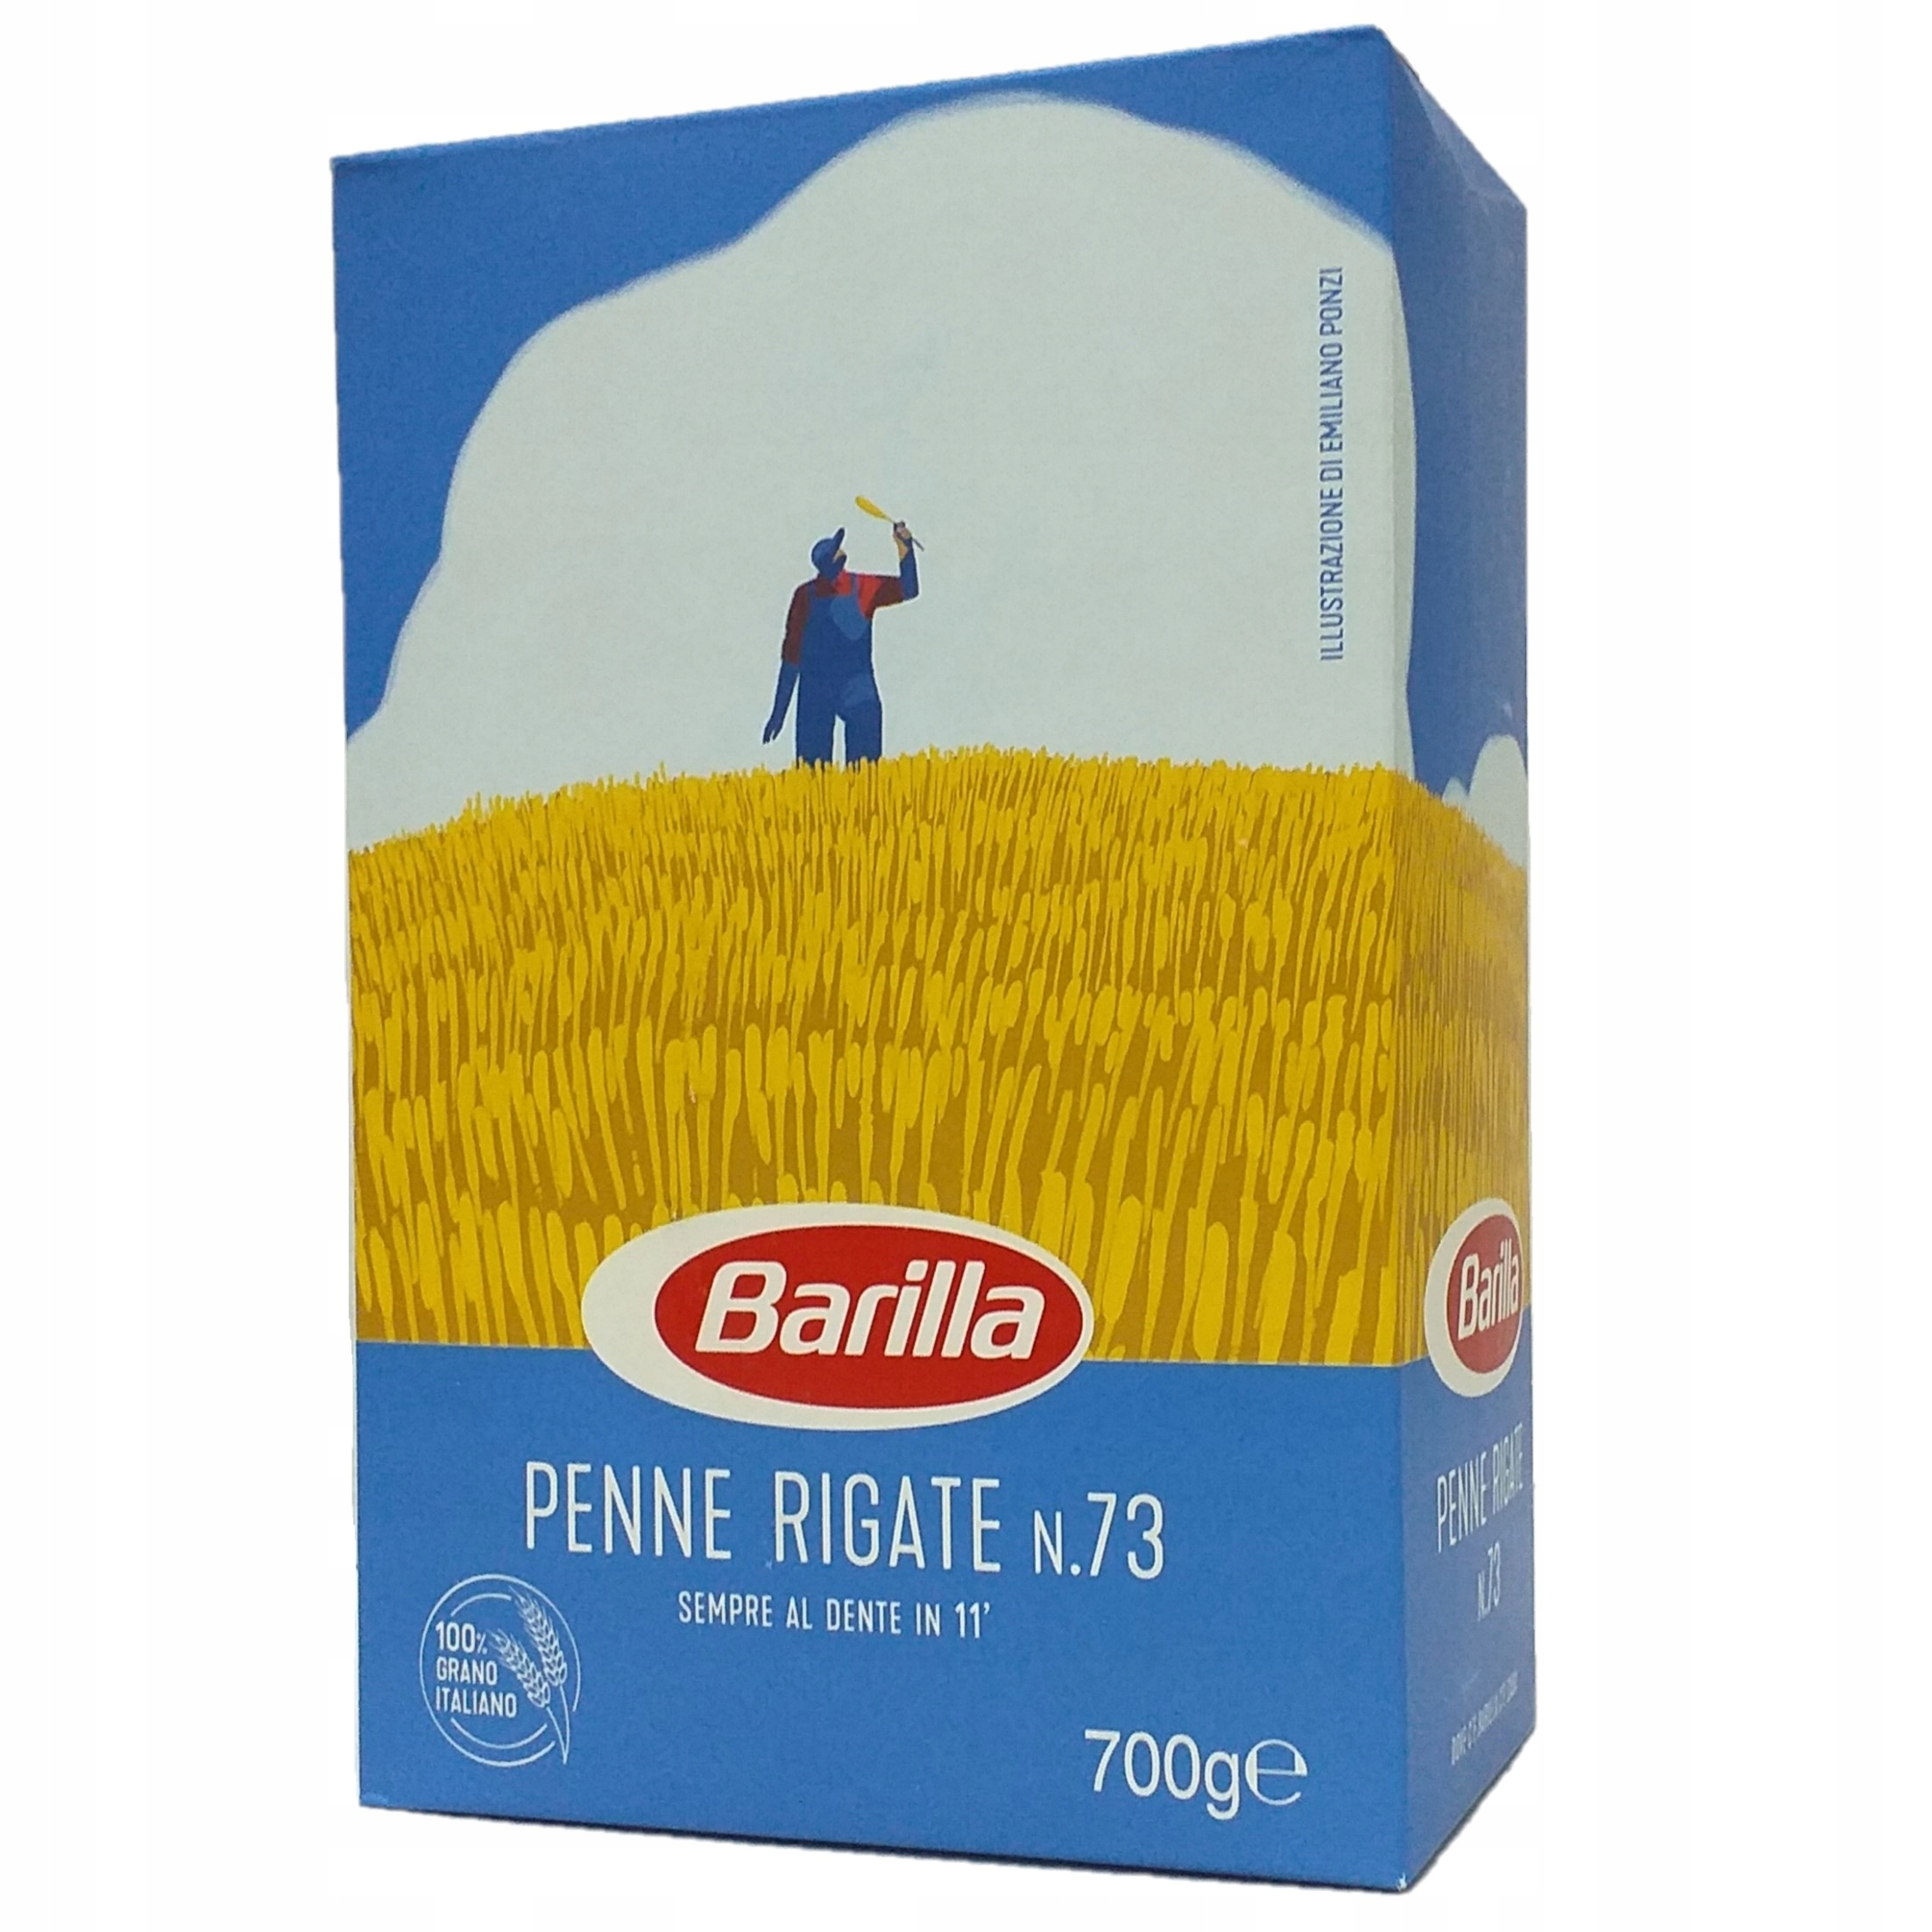 Barilla Penne Rigate 700гр оригинальная итальянская паста